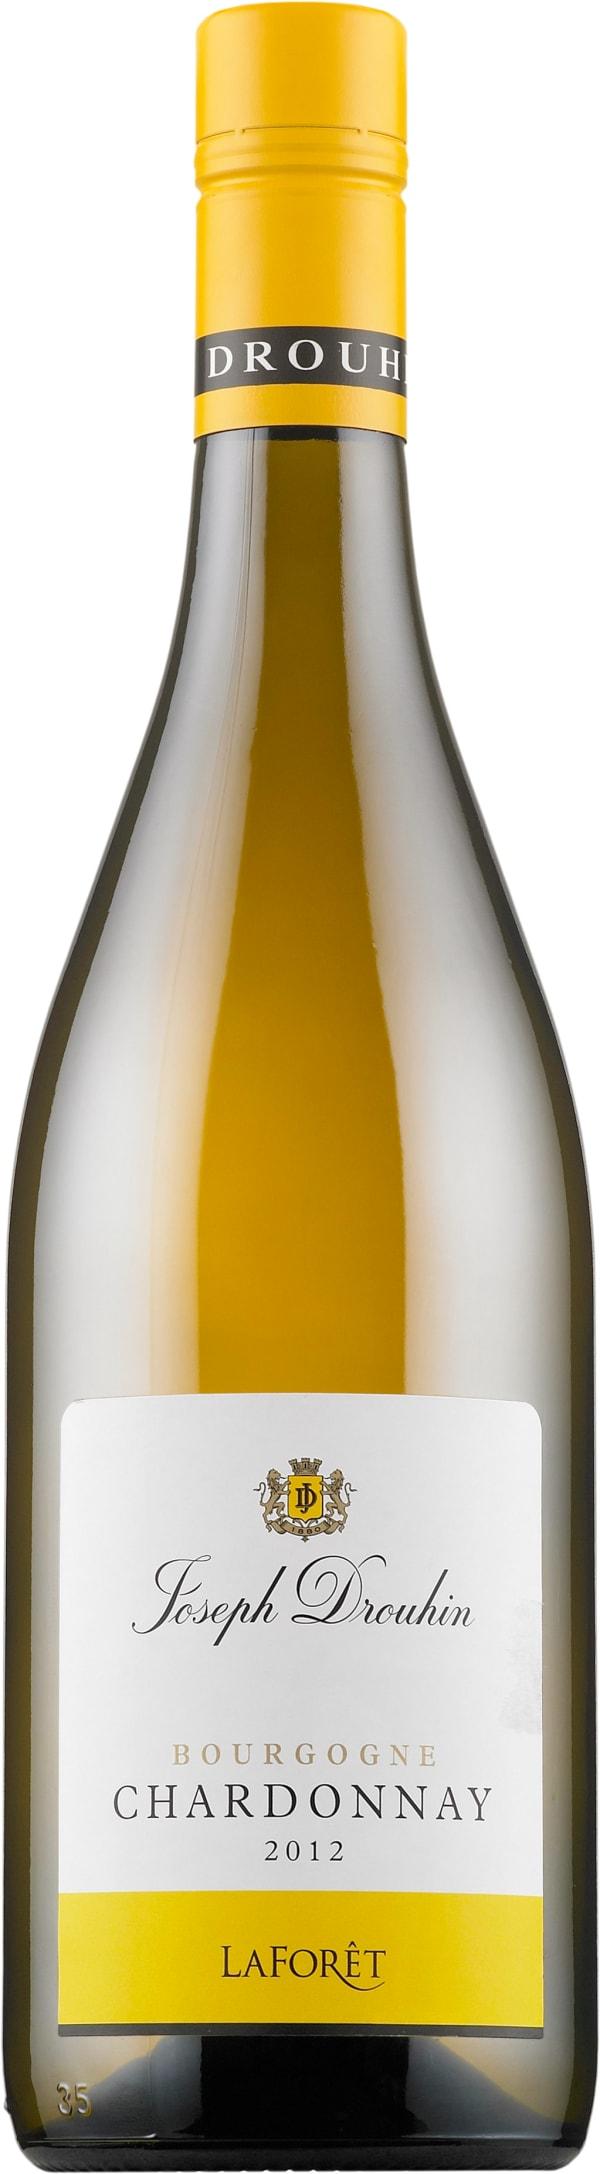 Joseph Drouhin Laforêt Bourgogne Chardonnay 2018